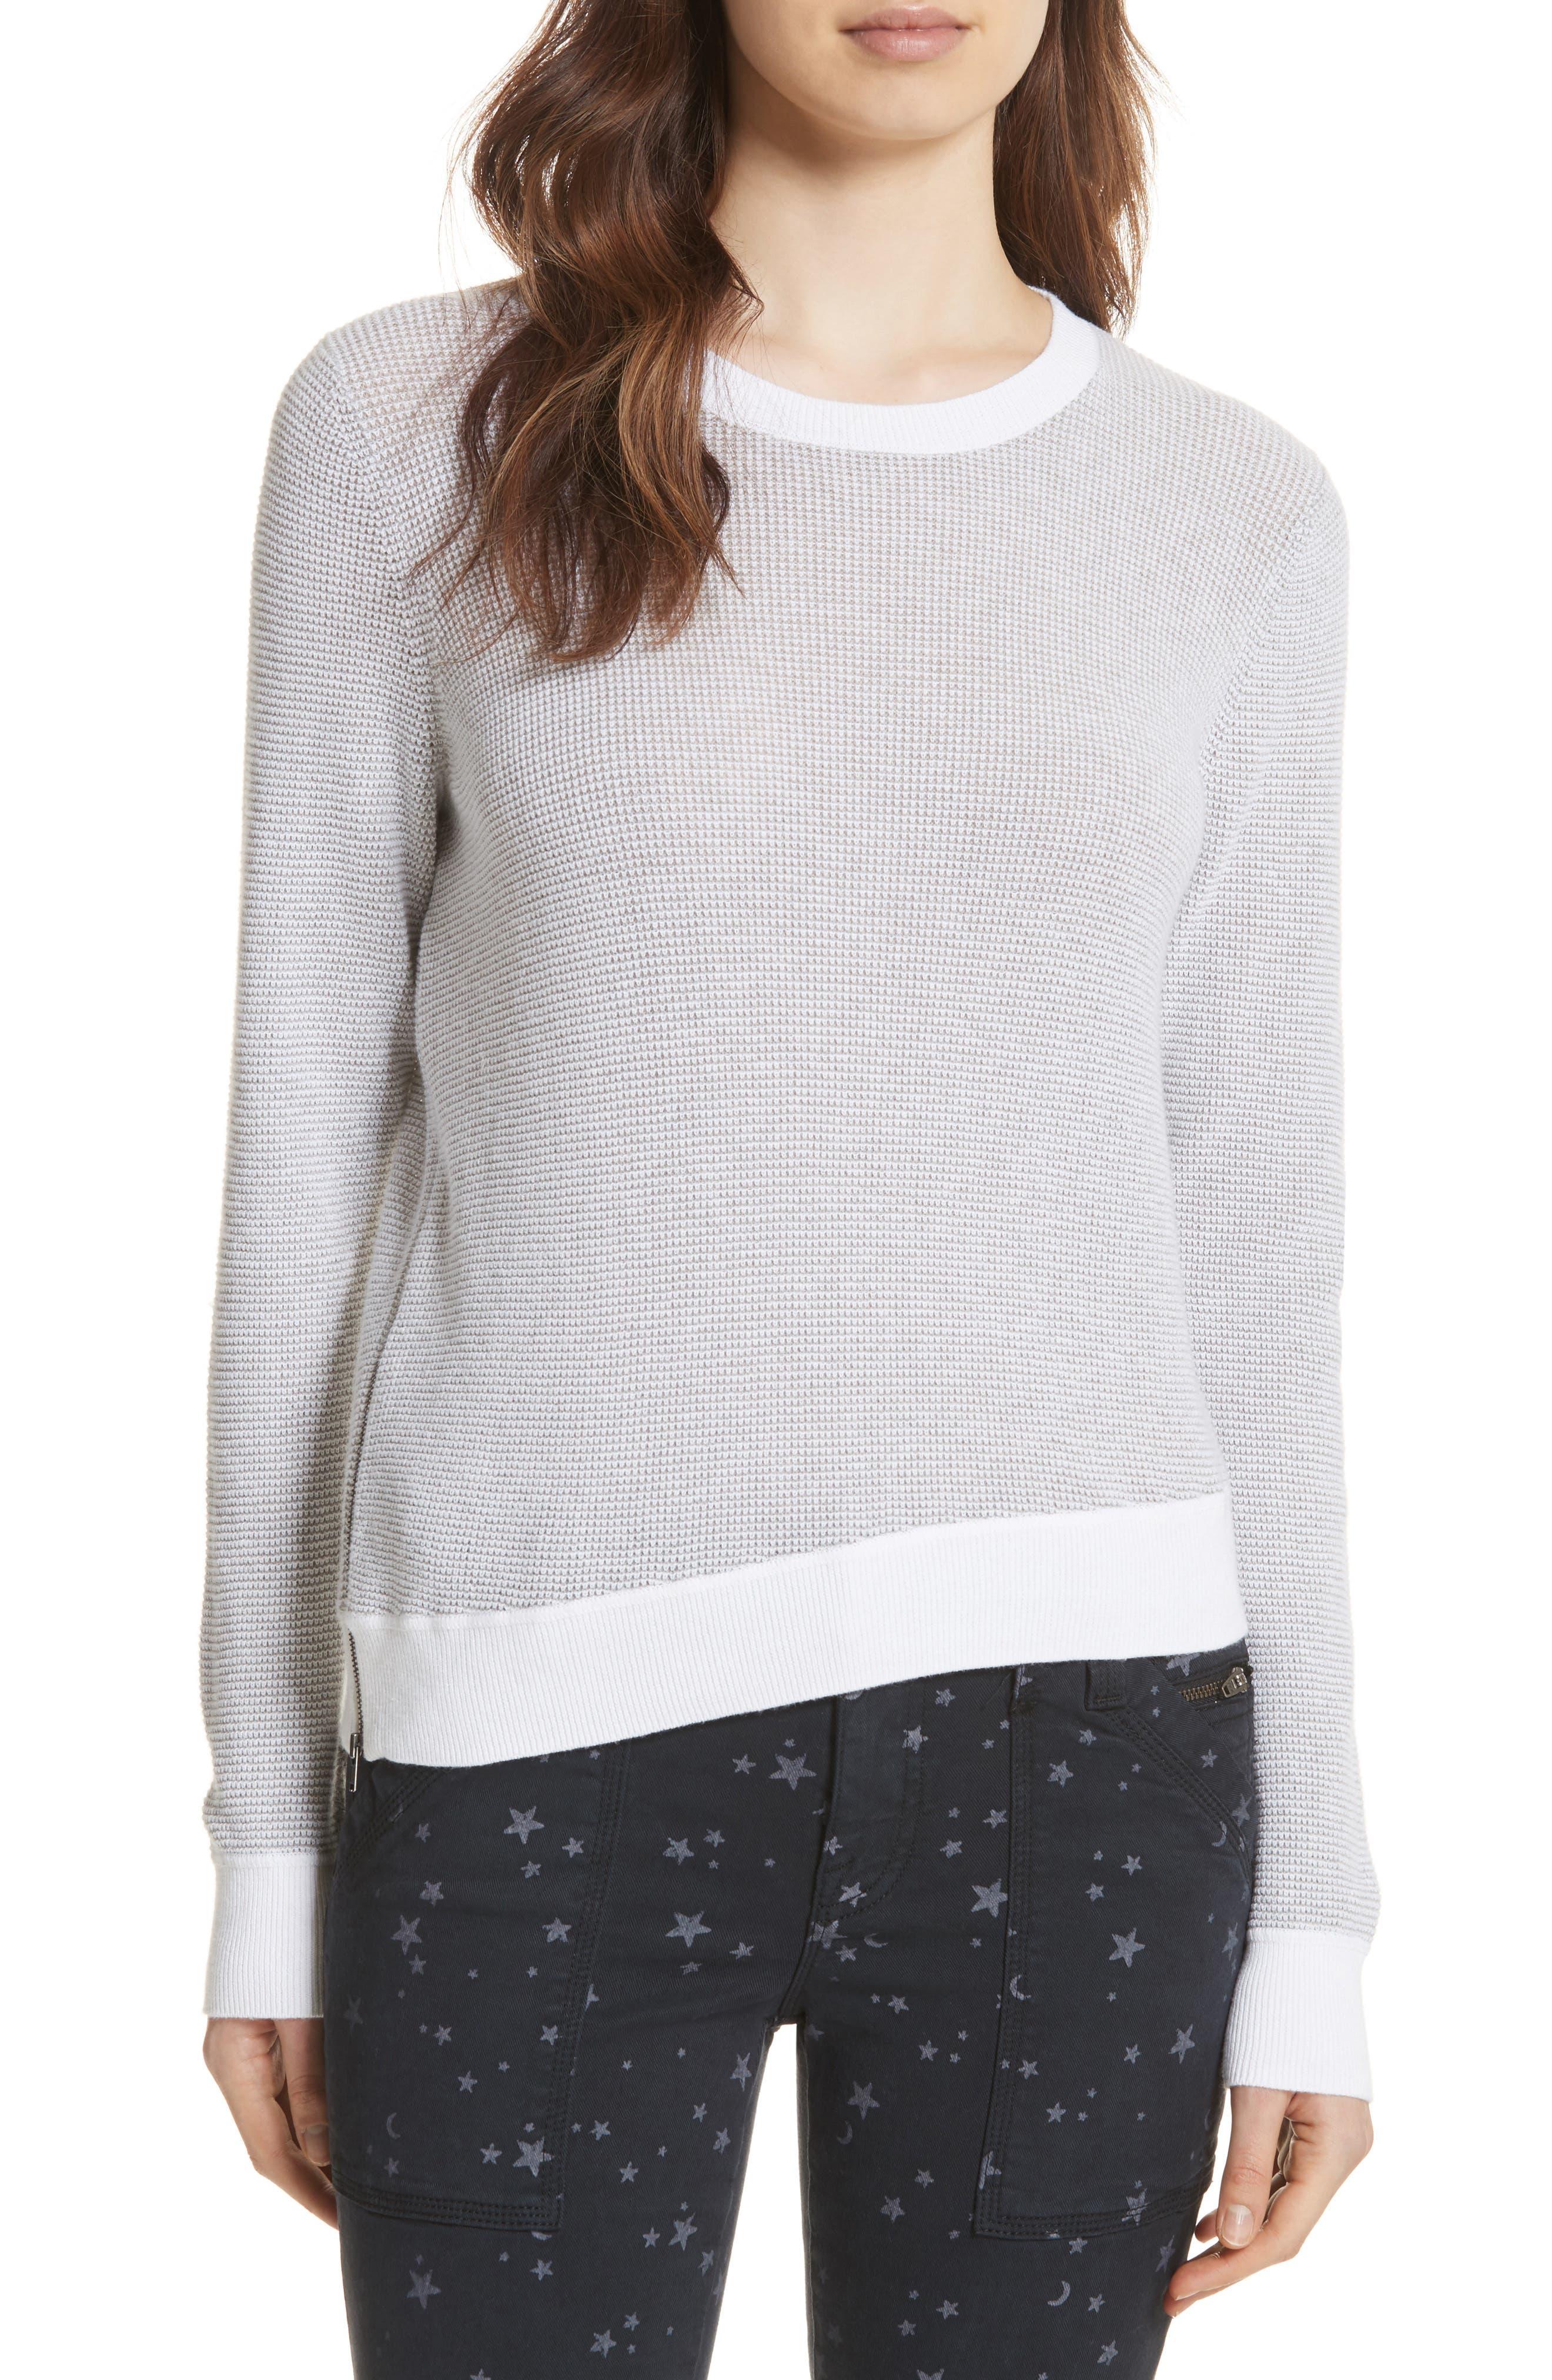 Laurana Cotton & Cashmere Sweater,                             Main thumbnail 1, color,